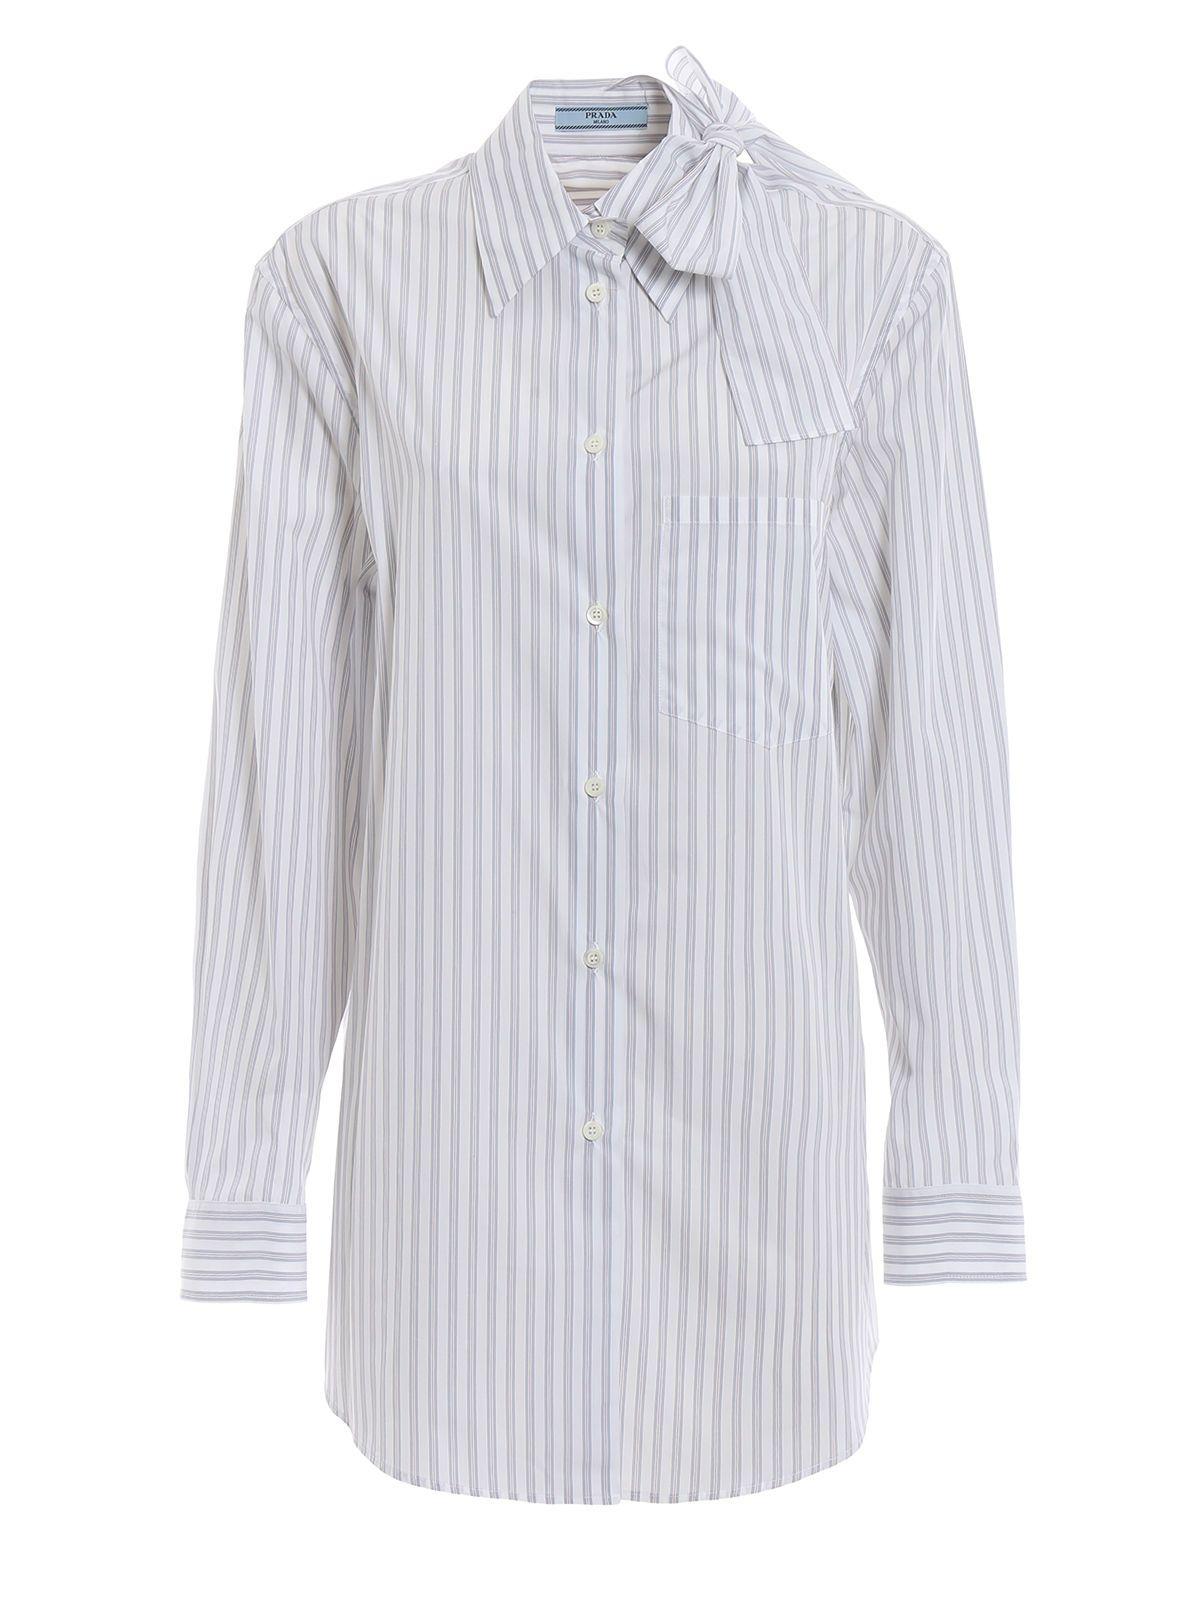 Prada Striped Bow Collar Shirt